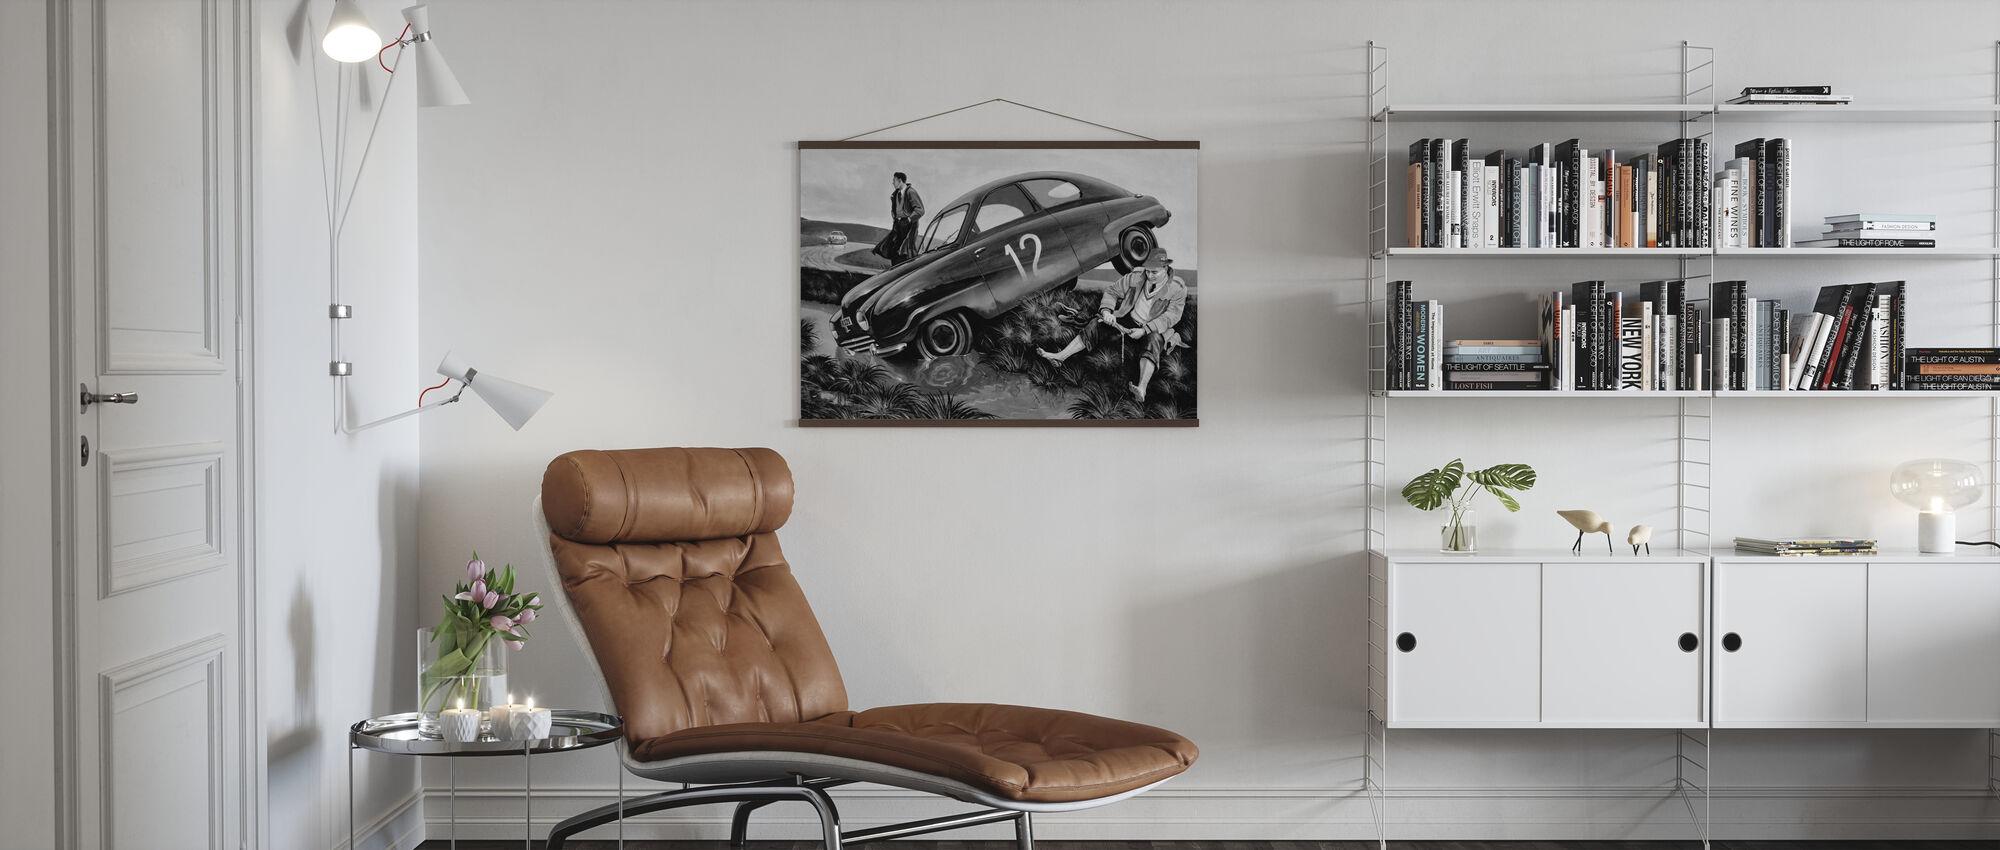 Carlsson Car BW - Poster - Living Room